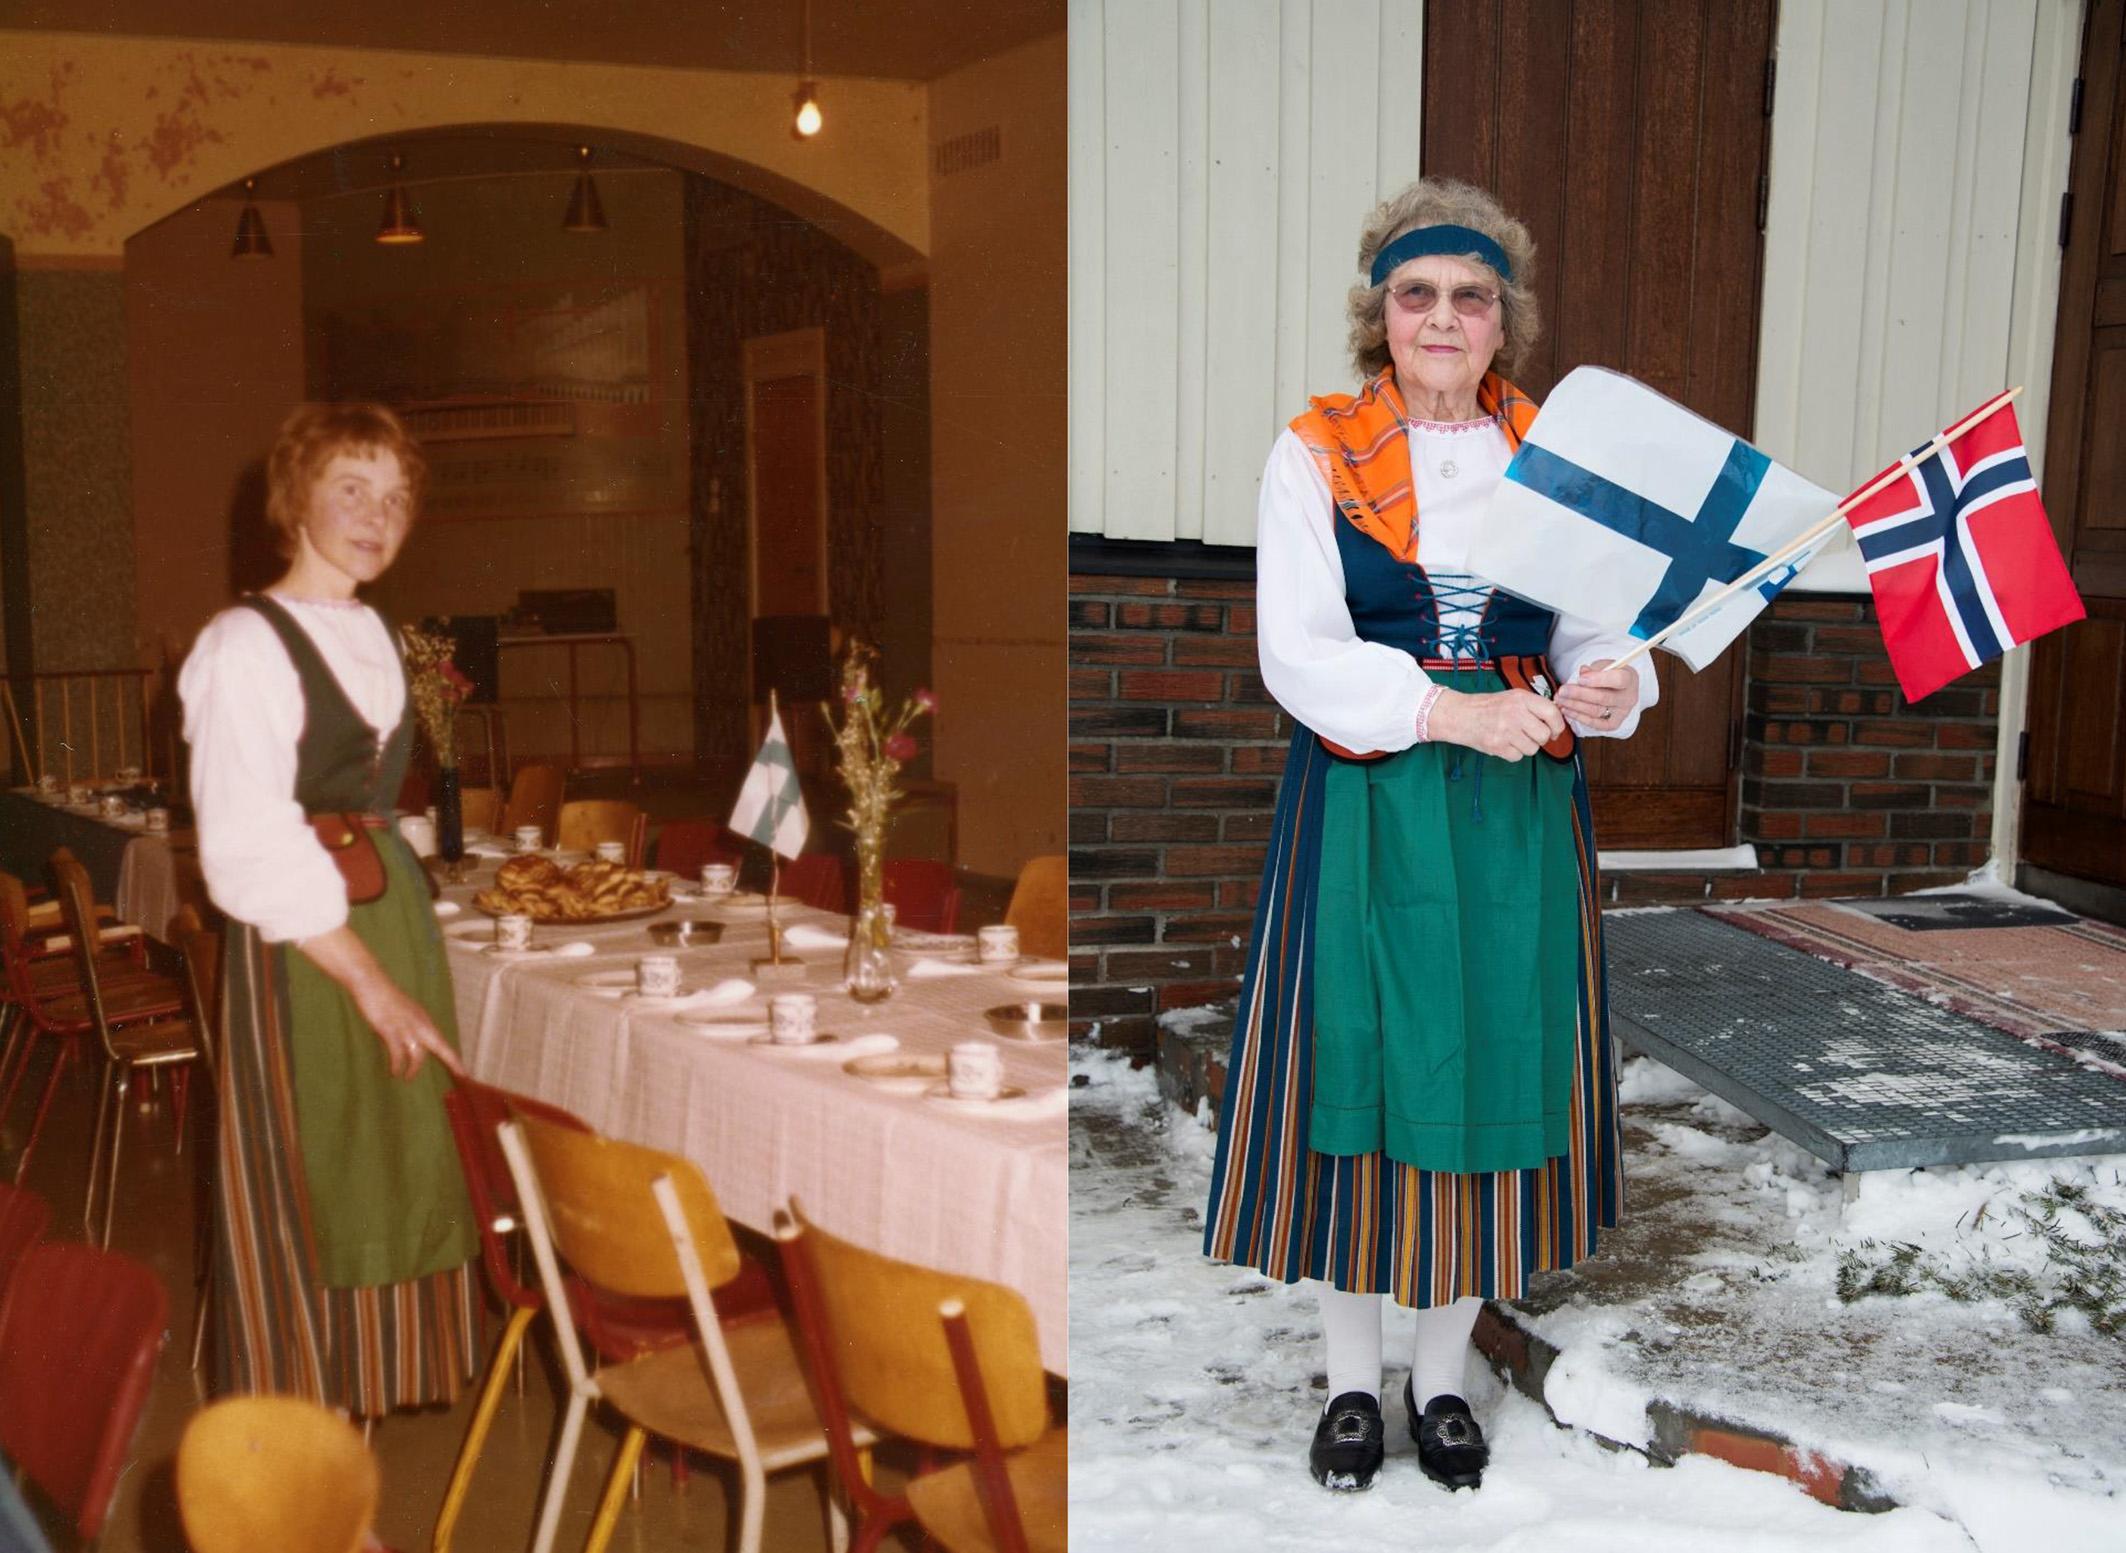 Finland og Norge: Samtid, identitet og samarbeid